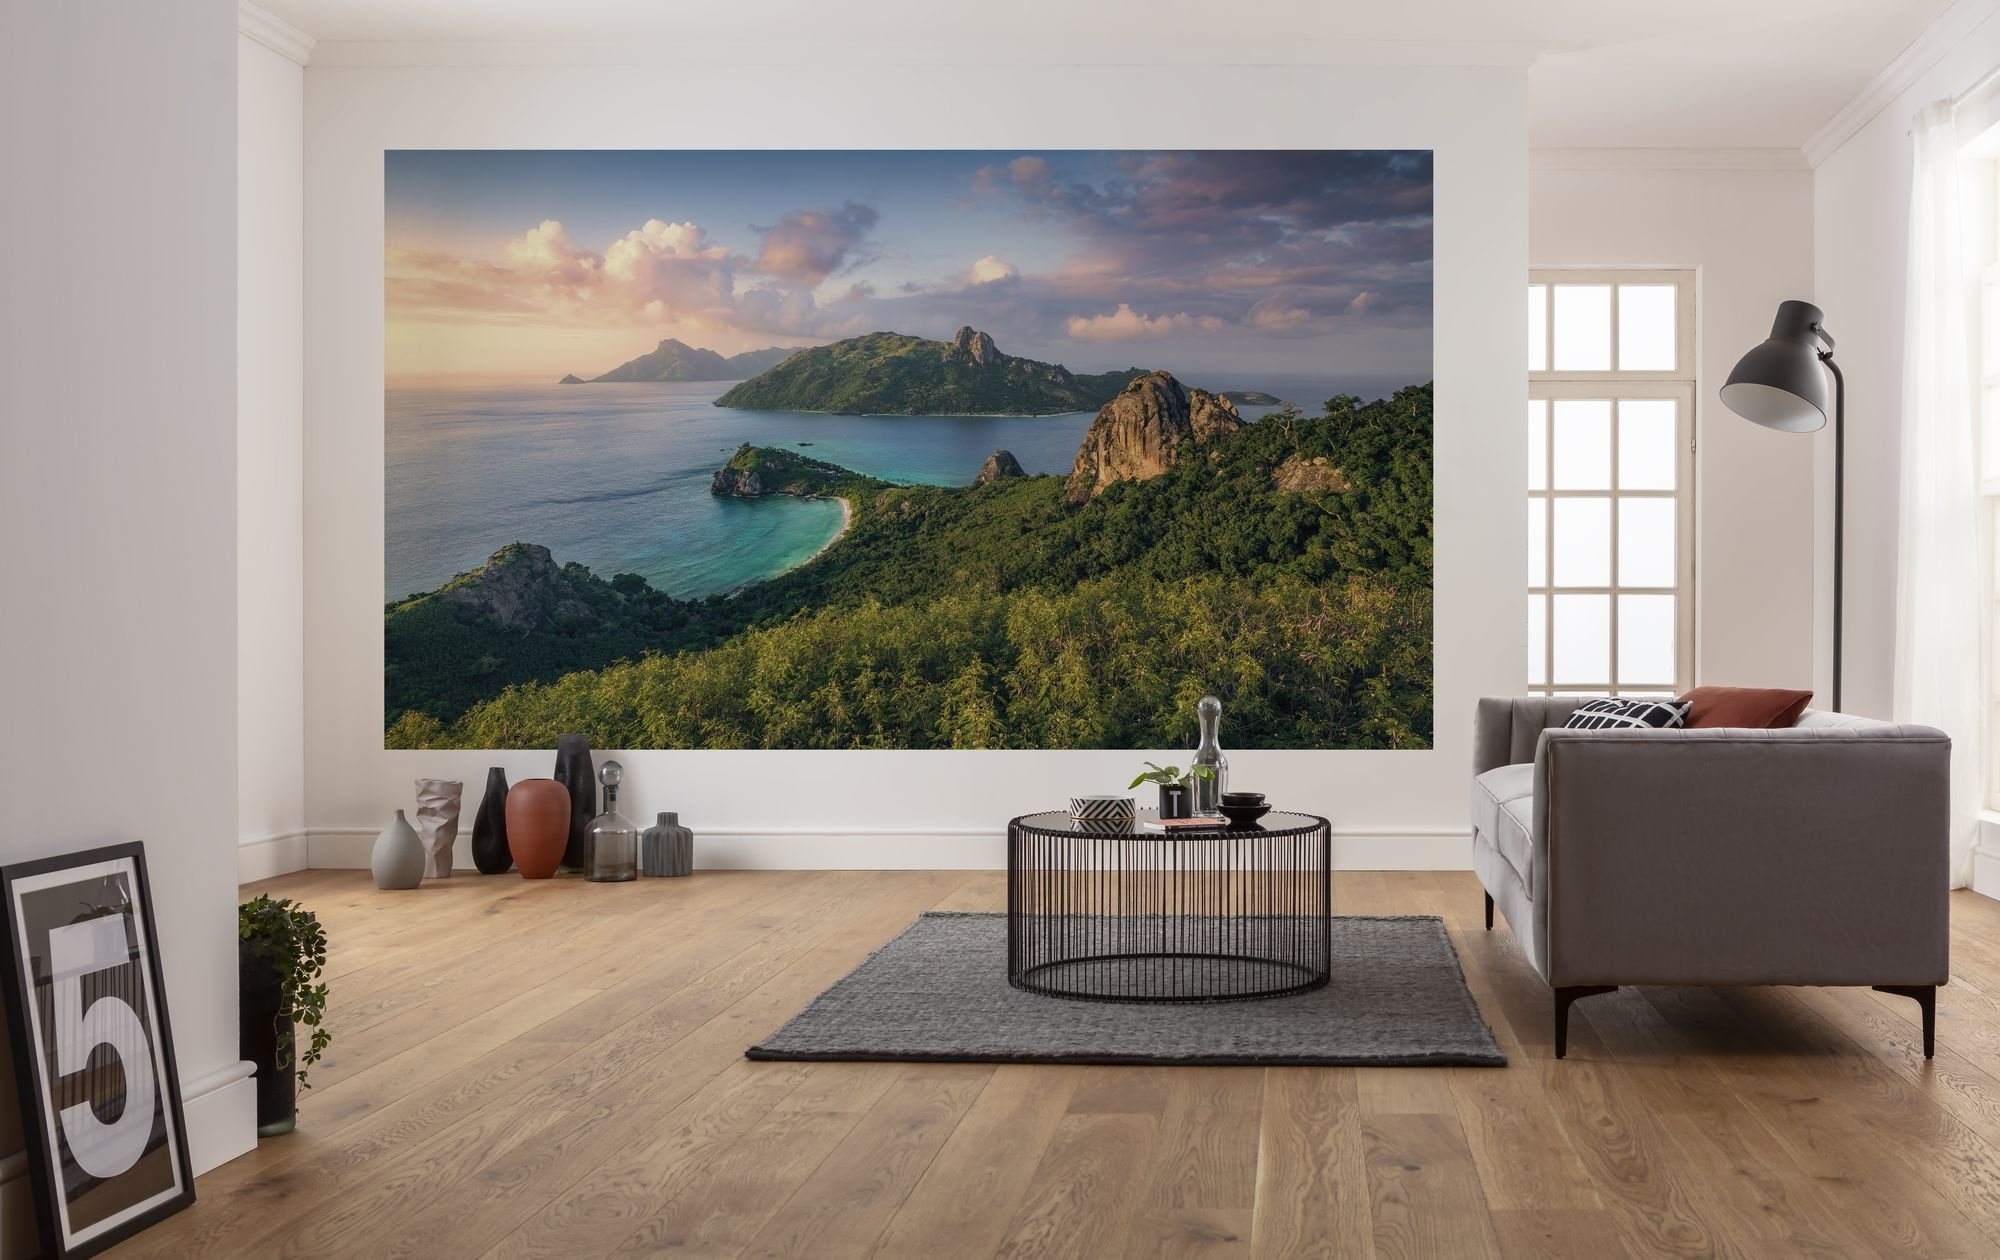 Stefan Hefele Edition 2 Fotobehang Komar - Natuur behang MONKAY ISLAND